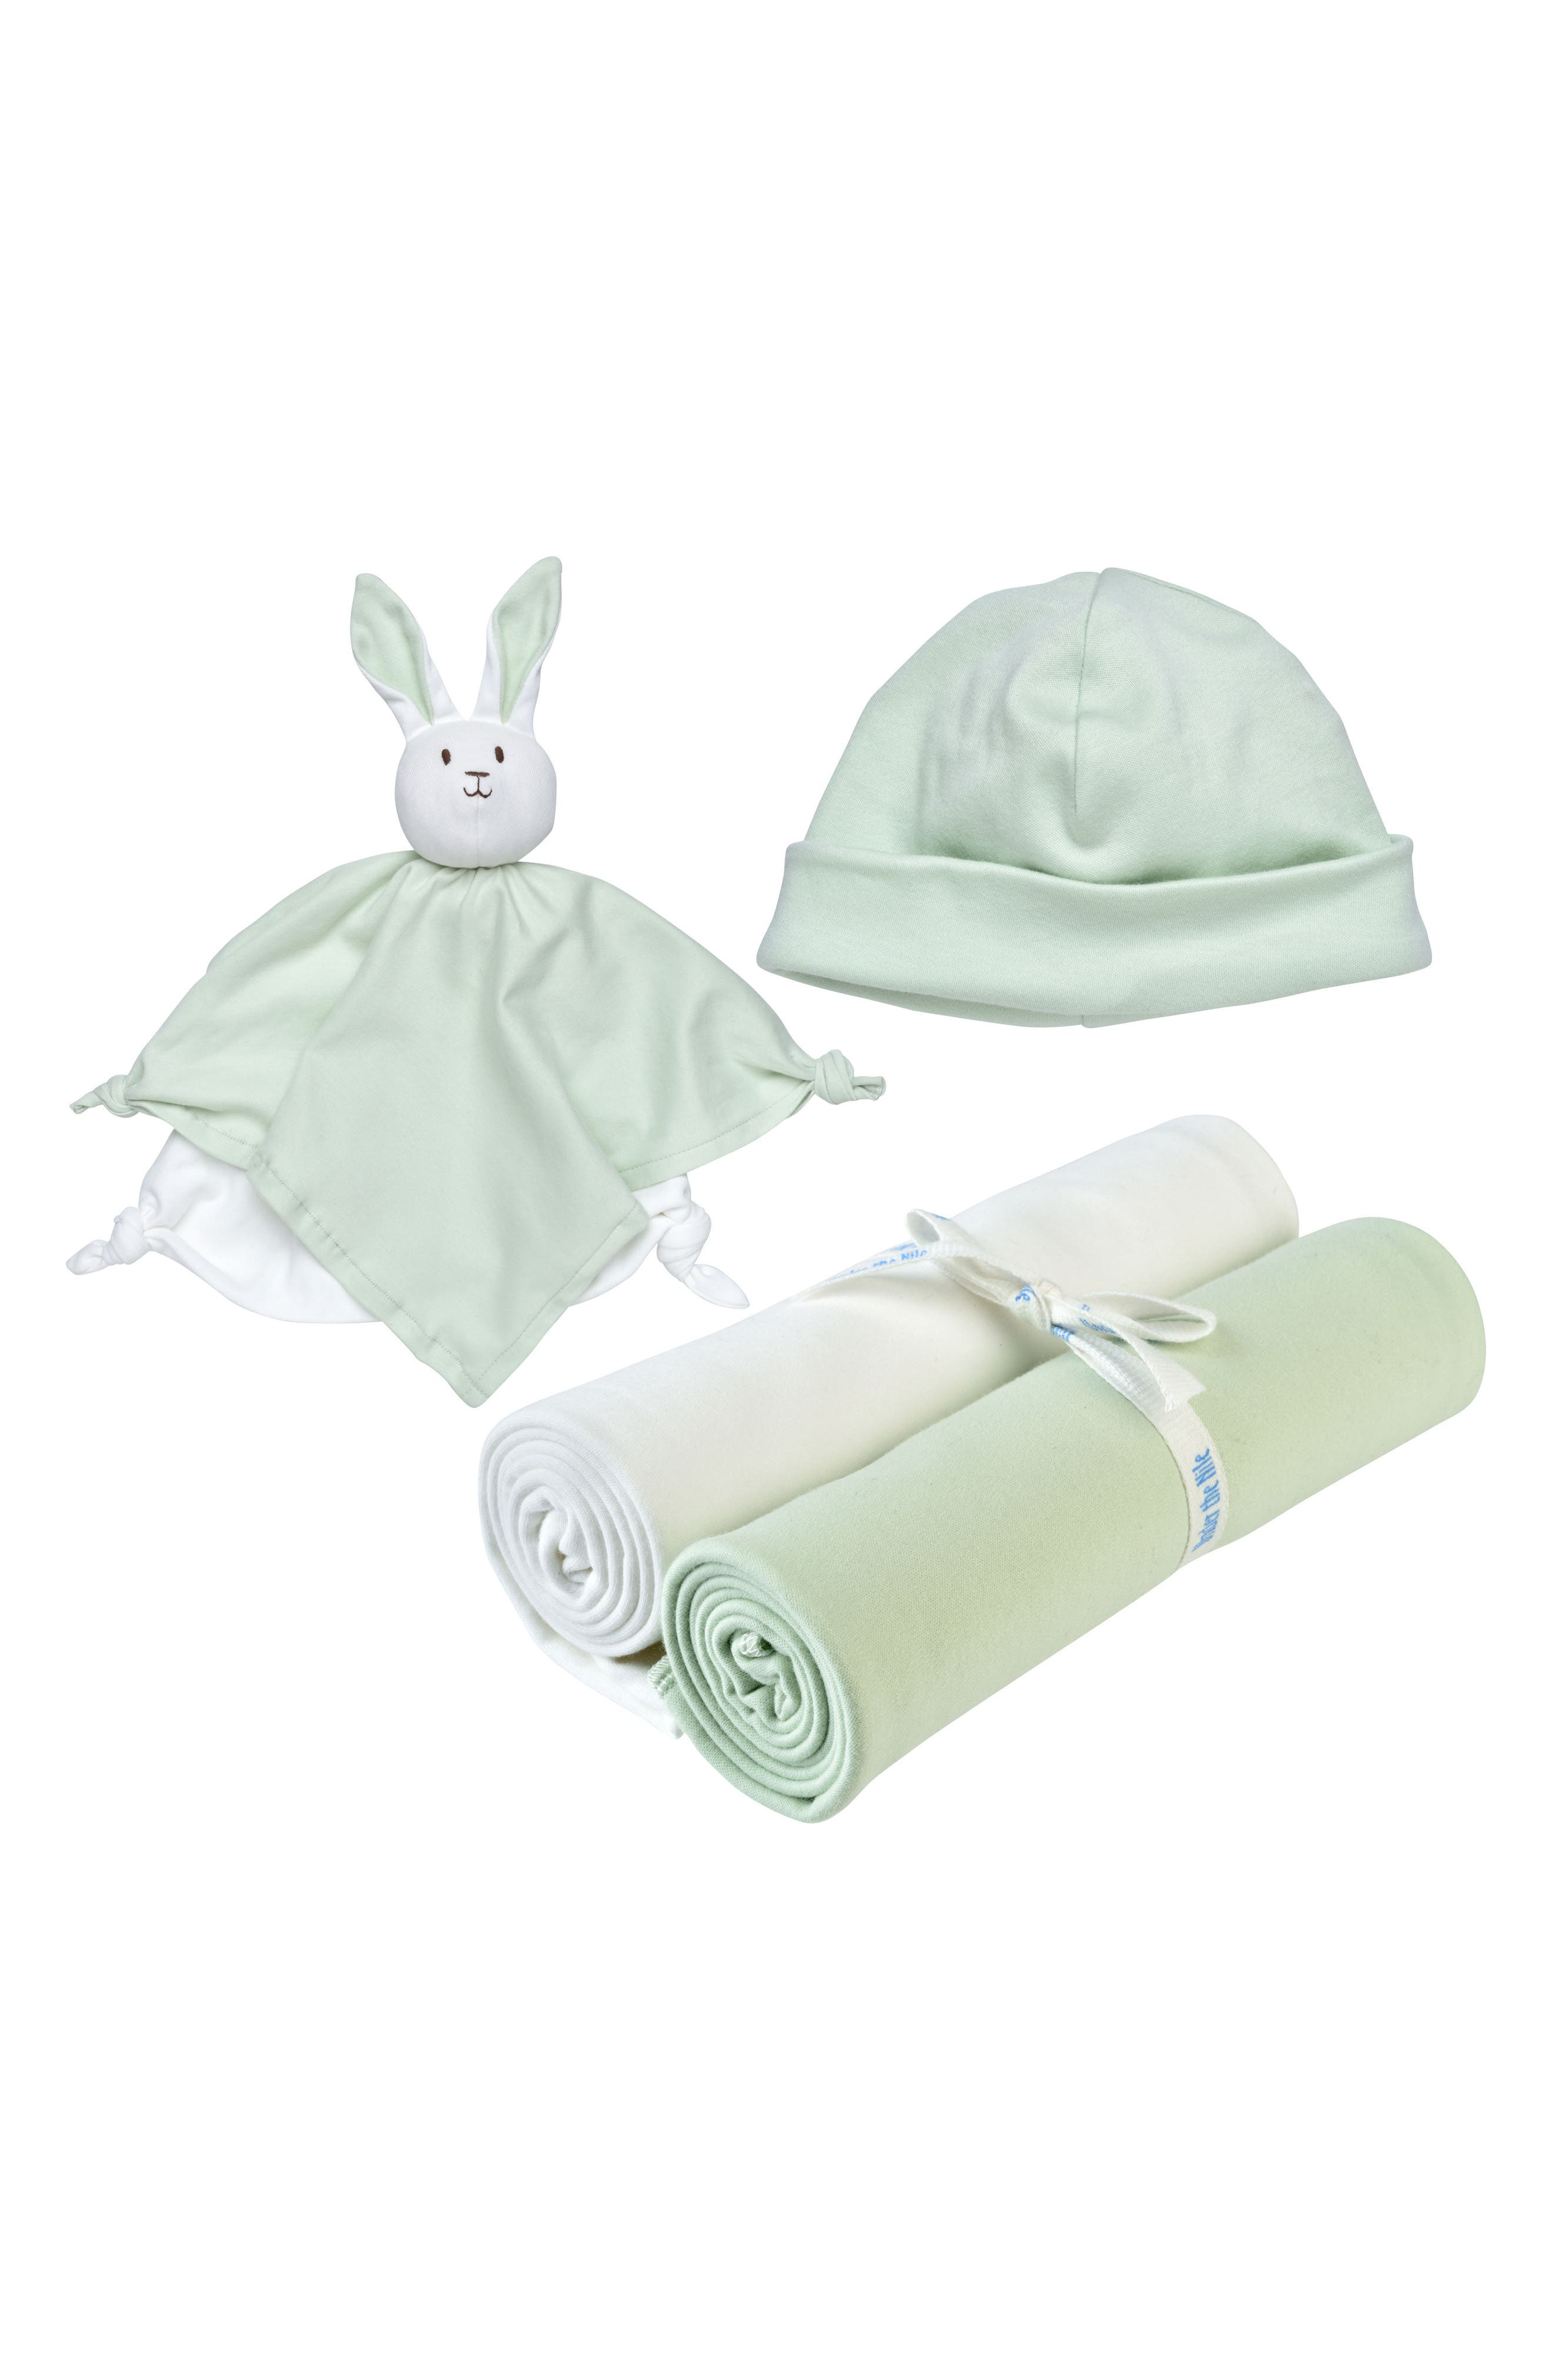 Under the Nile 4-Piece Swaddle Blanket, Beanie & Rabbit Lovey Toy Set